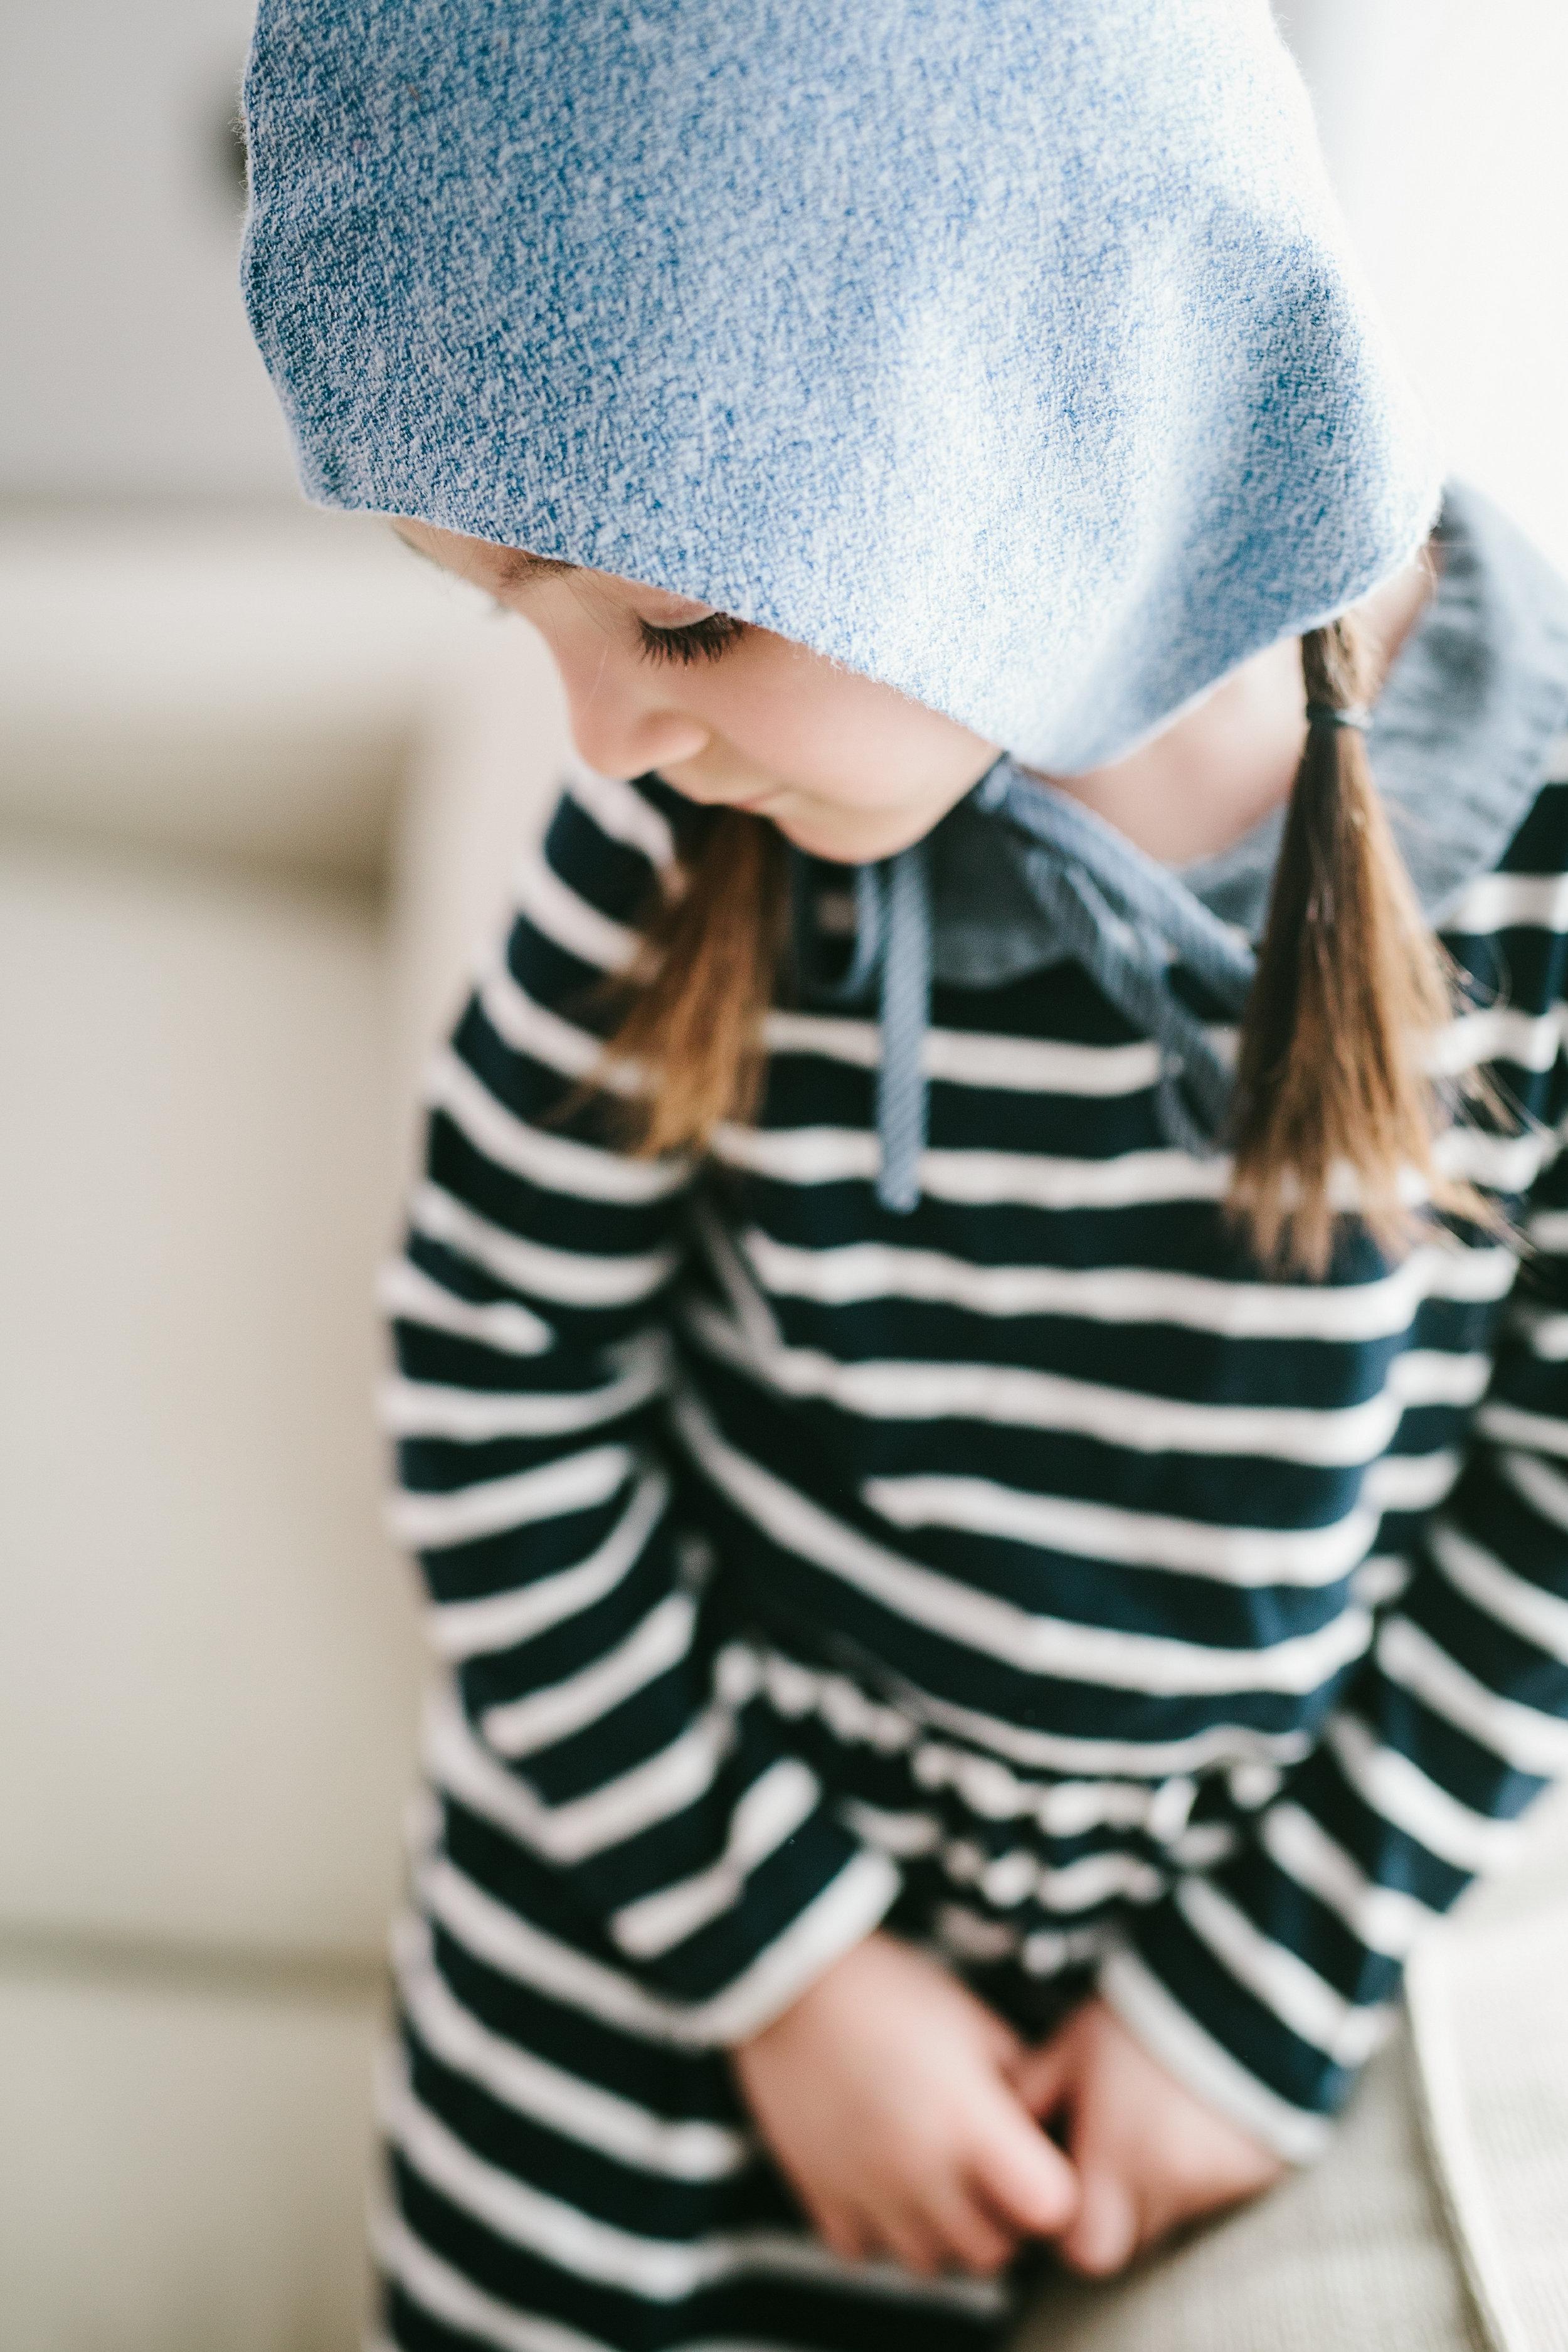 willaby bonnet, anchorge alaska lifestyle photographer